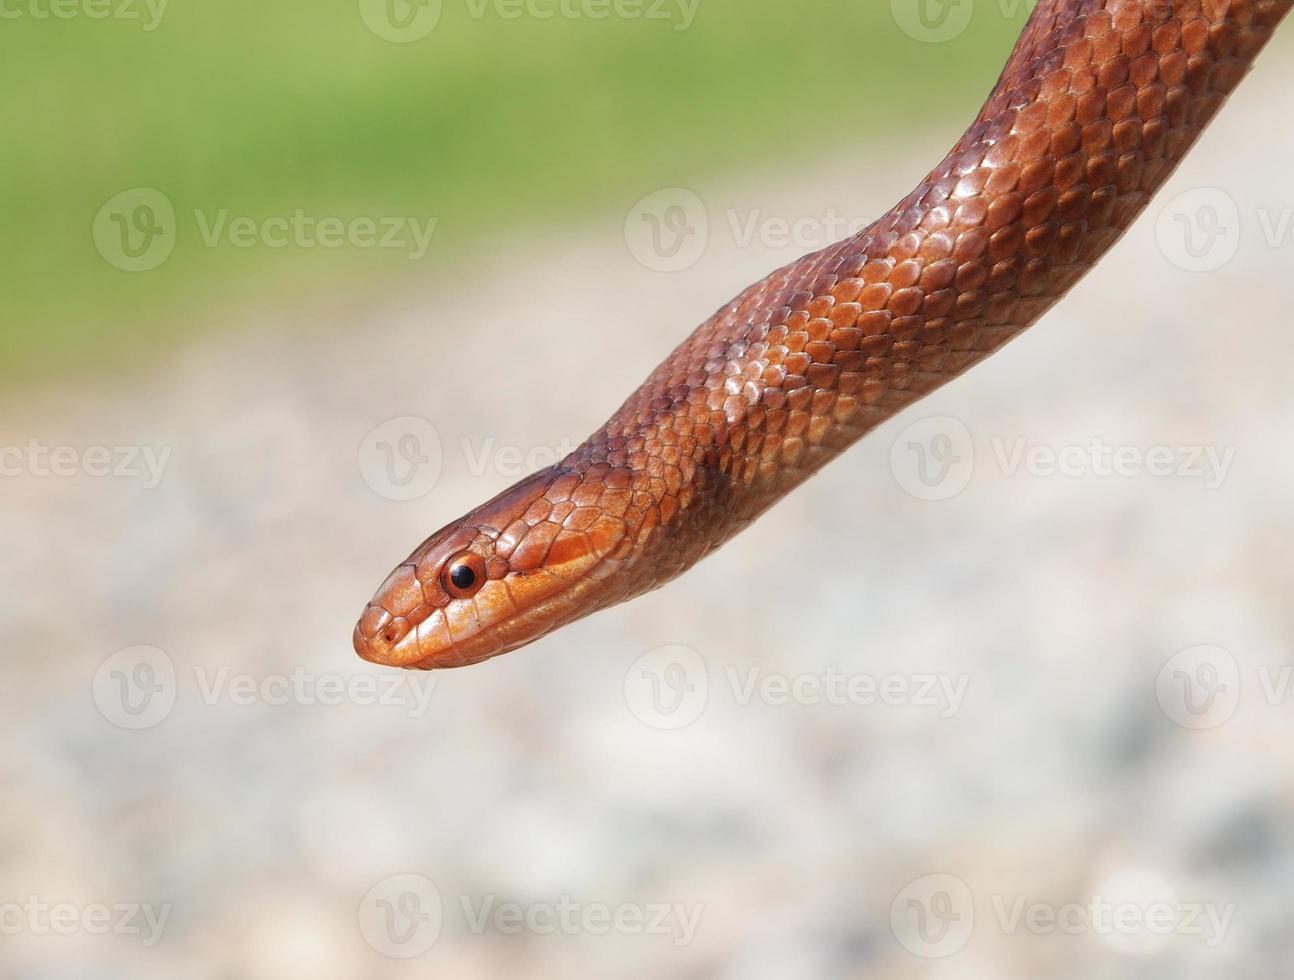 Gros plan du serpent lisse - Coronella austriaca photo